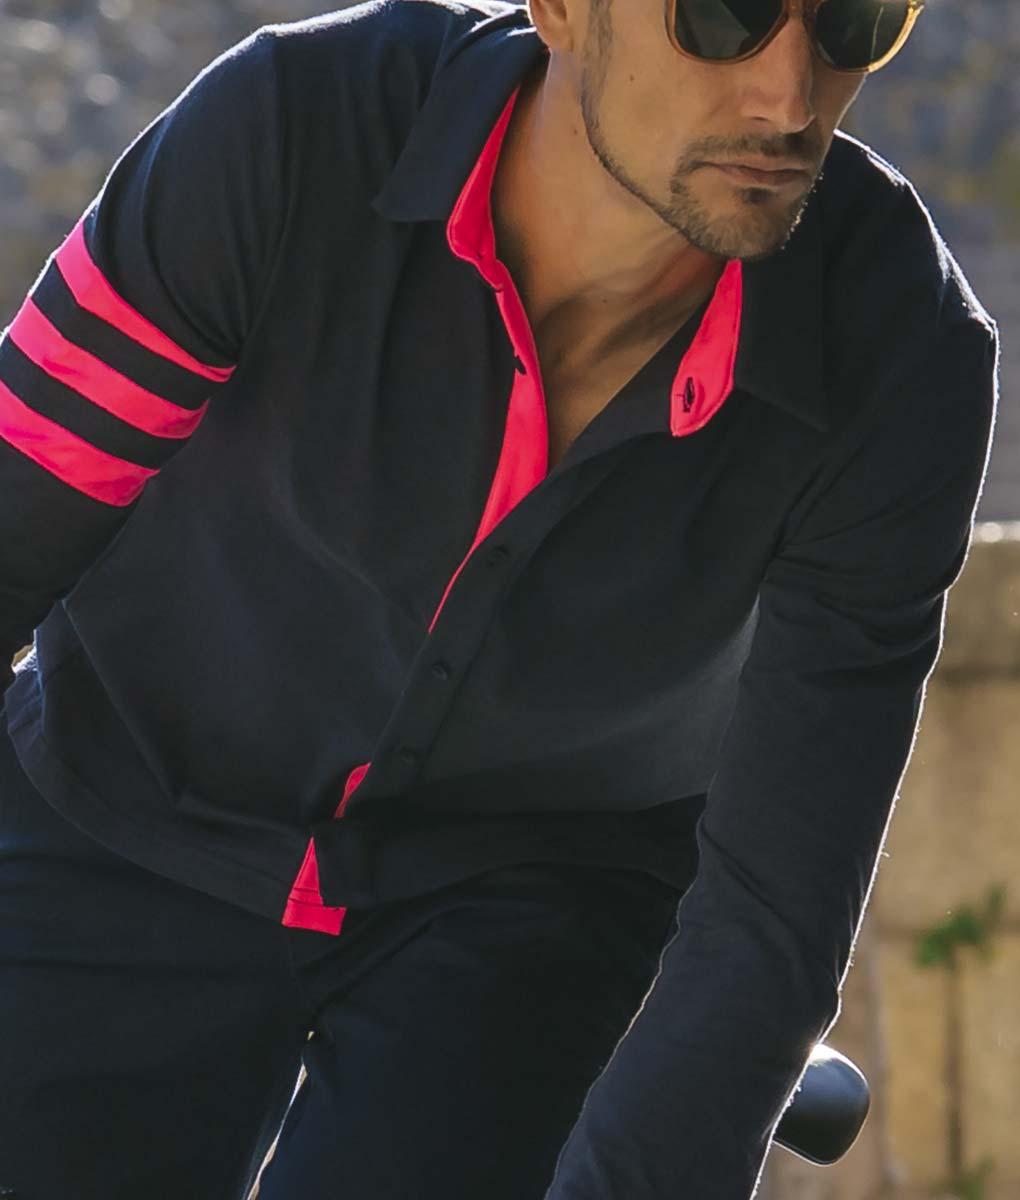 casual-cycling-transparent-Dark-Blue-Merino-Shirt-outside